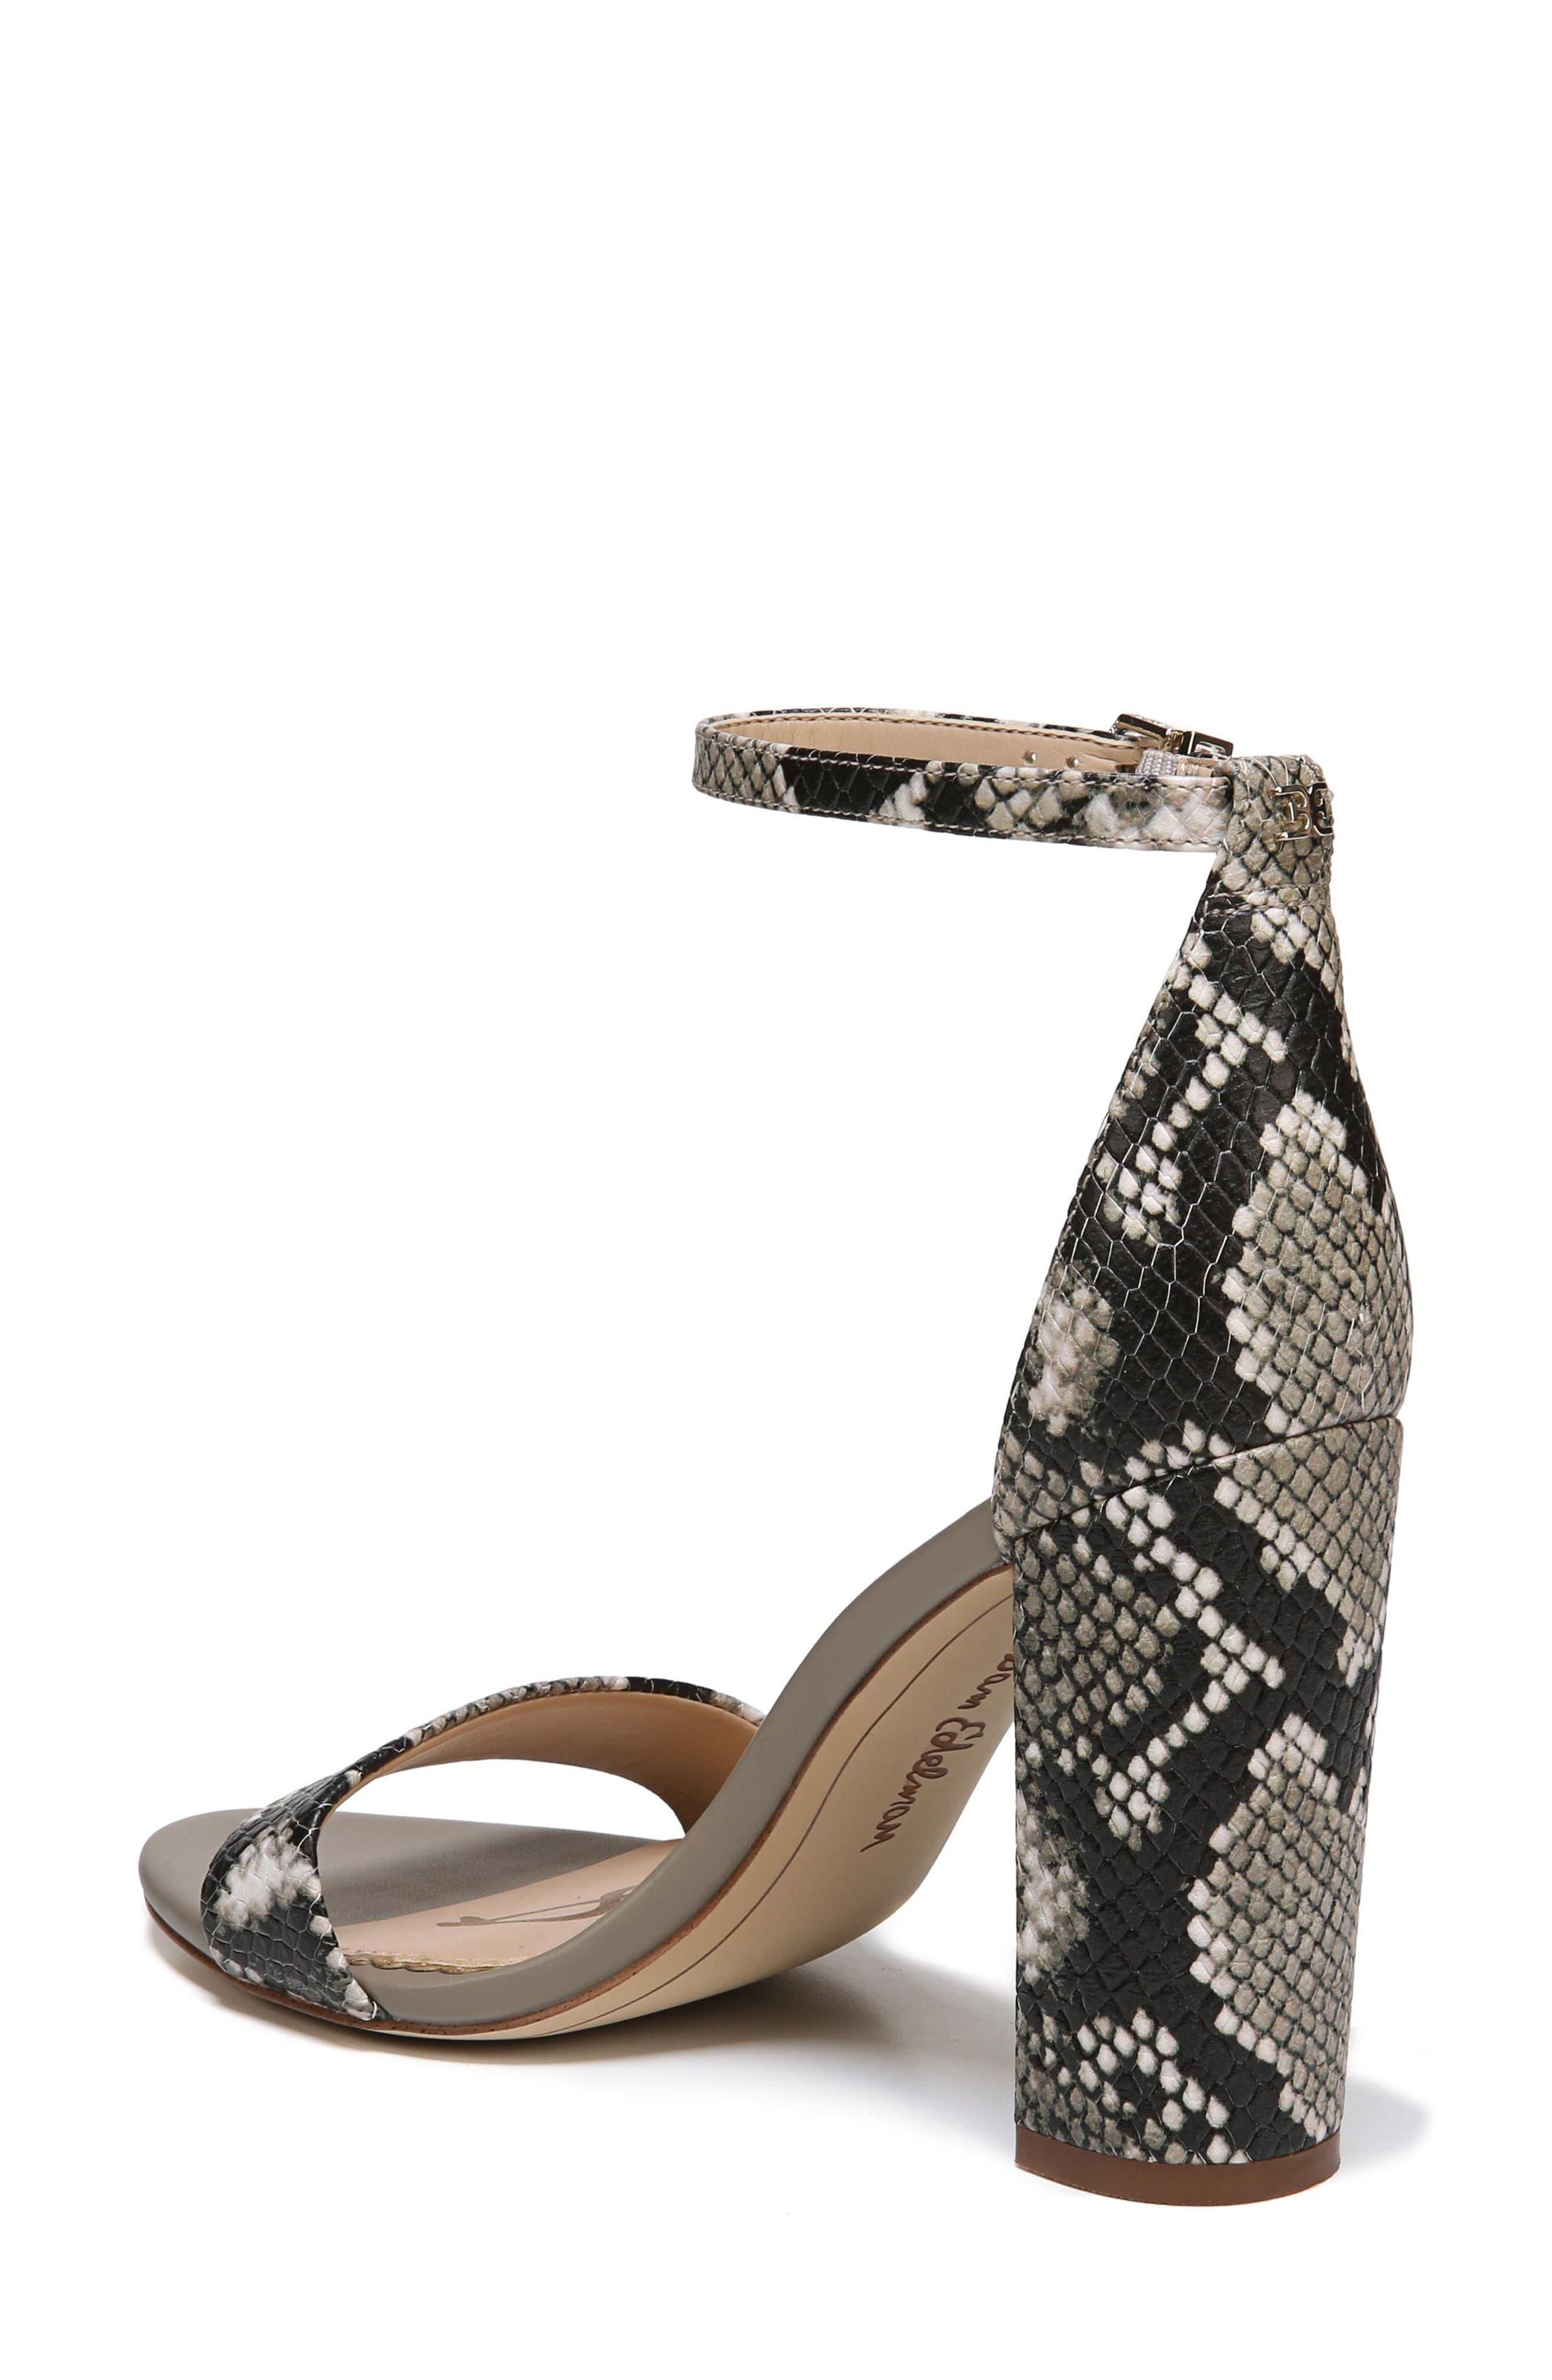 Yaro Ankle Strap Sandal,                             Alternate thumbnail 2, color,                             Natural Snake Print Leather